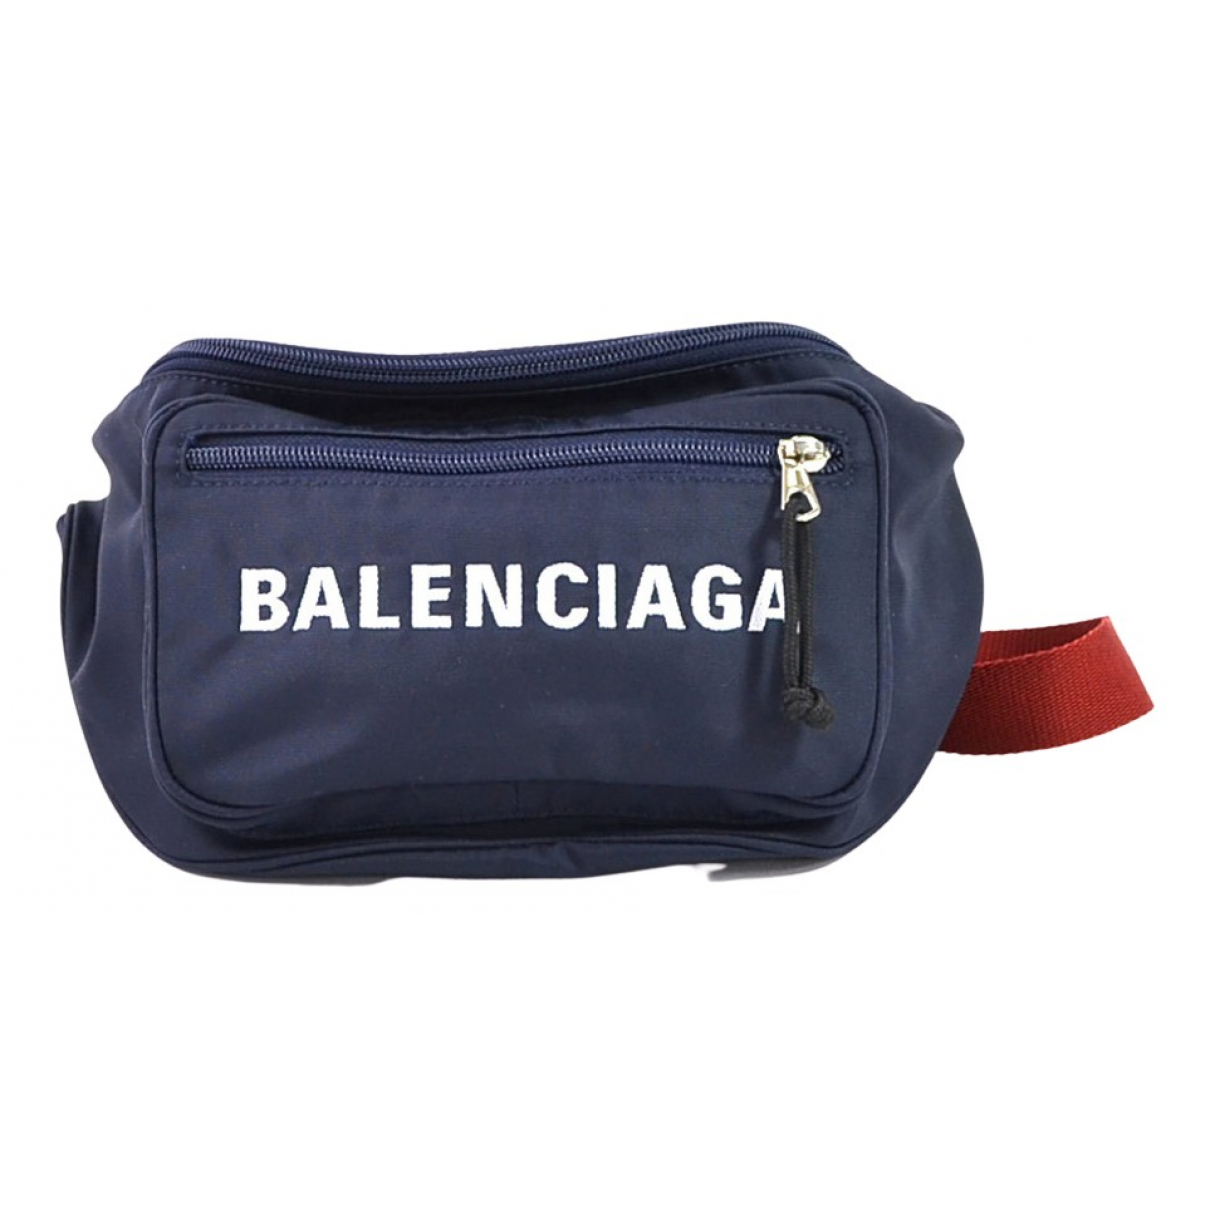 Balenciaga - Pochette   pour femme en toile - bleu